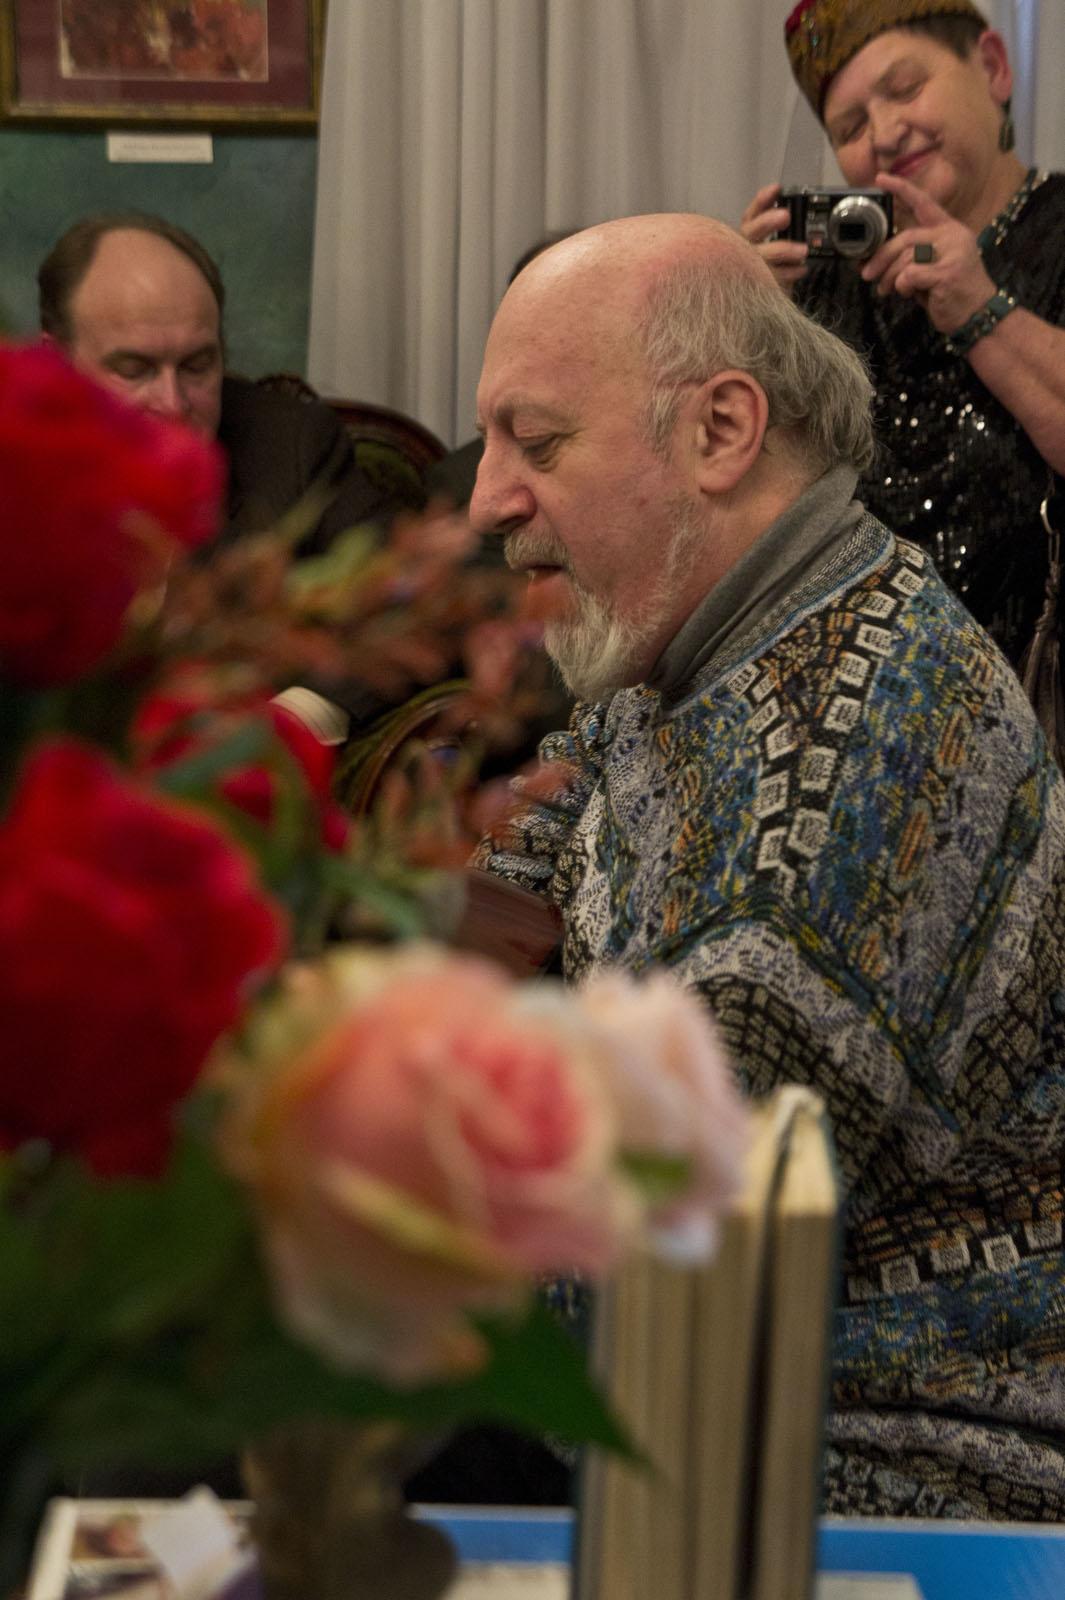 Фото №73618. Борис Григорьевич Вайнер